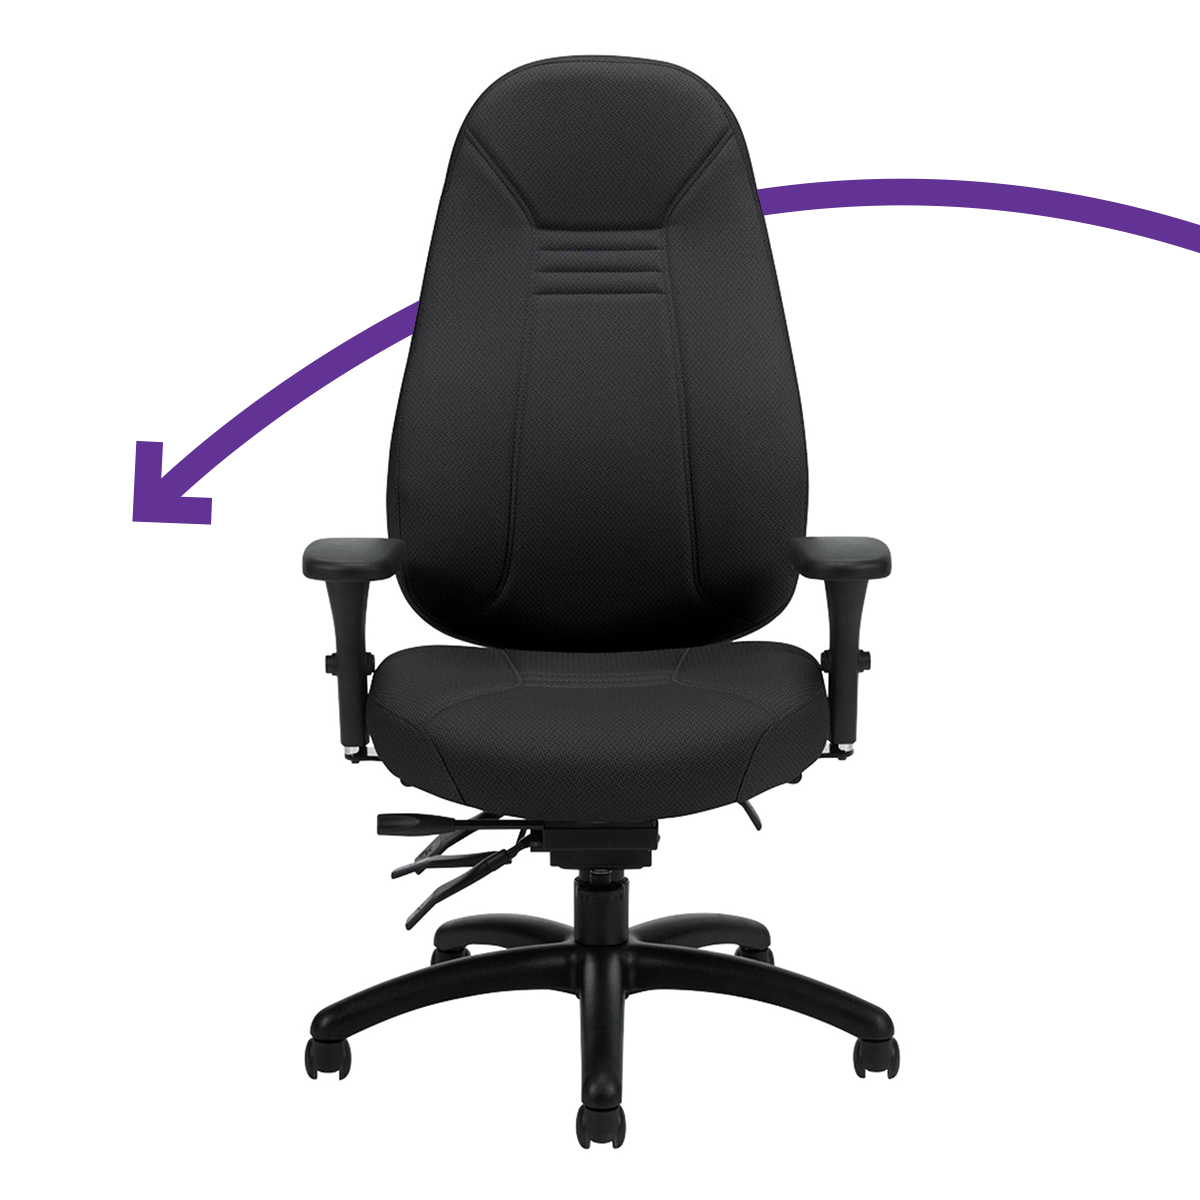 pret-chaise